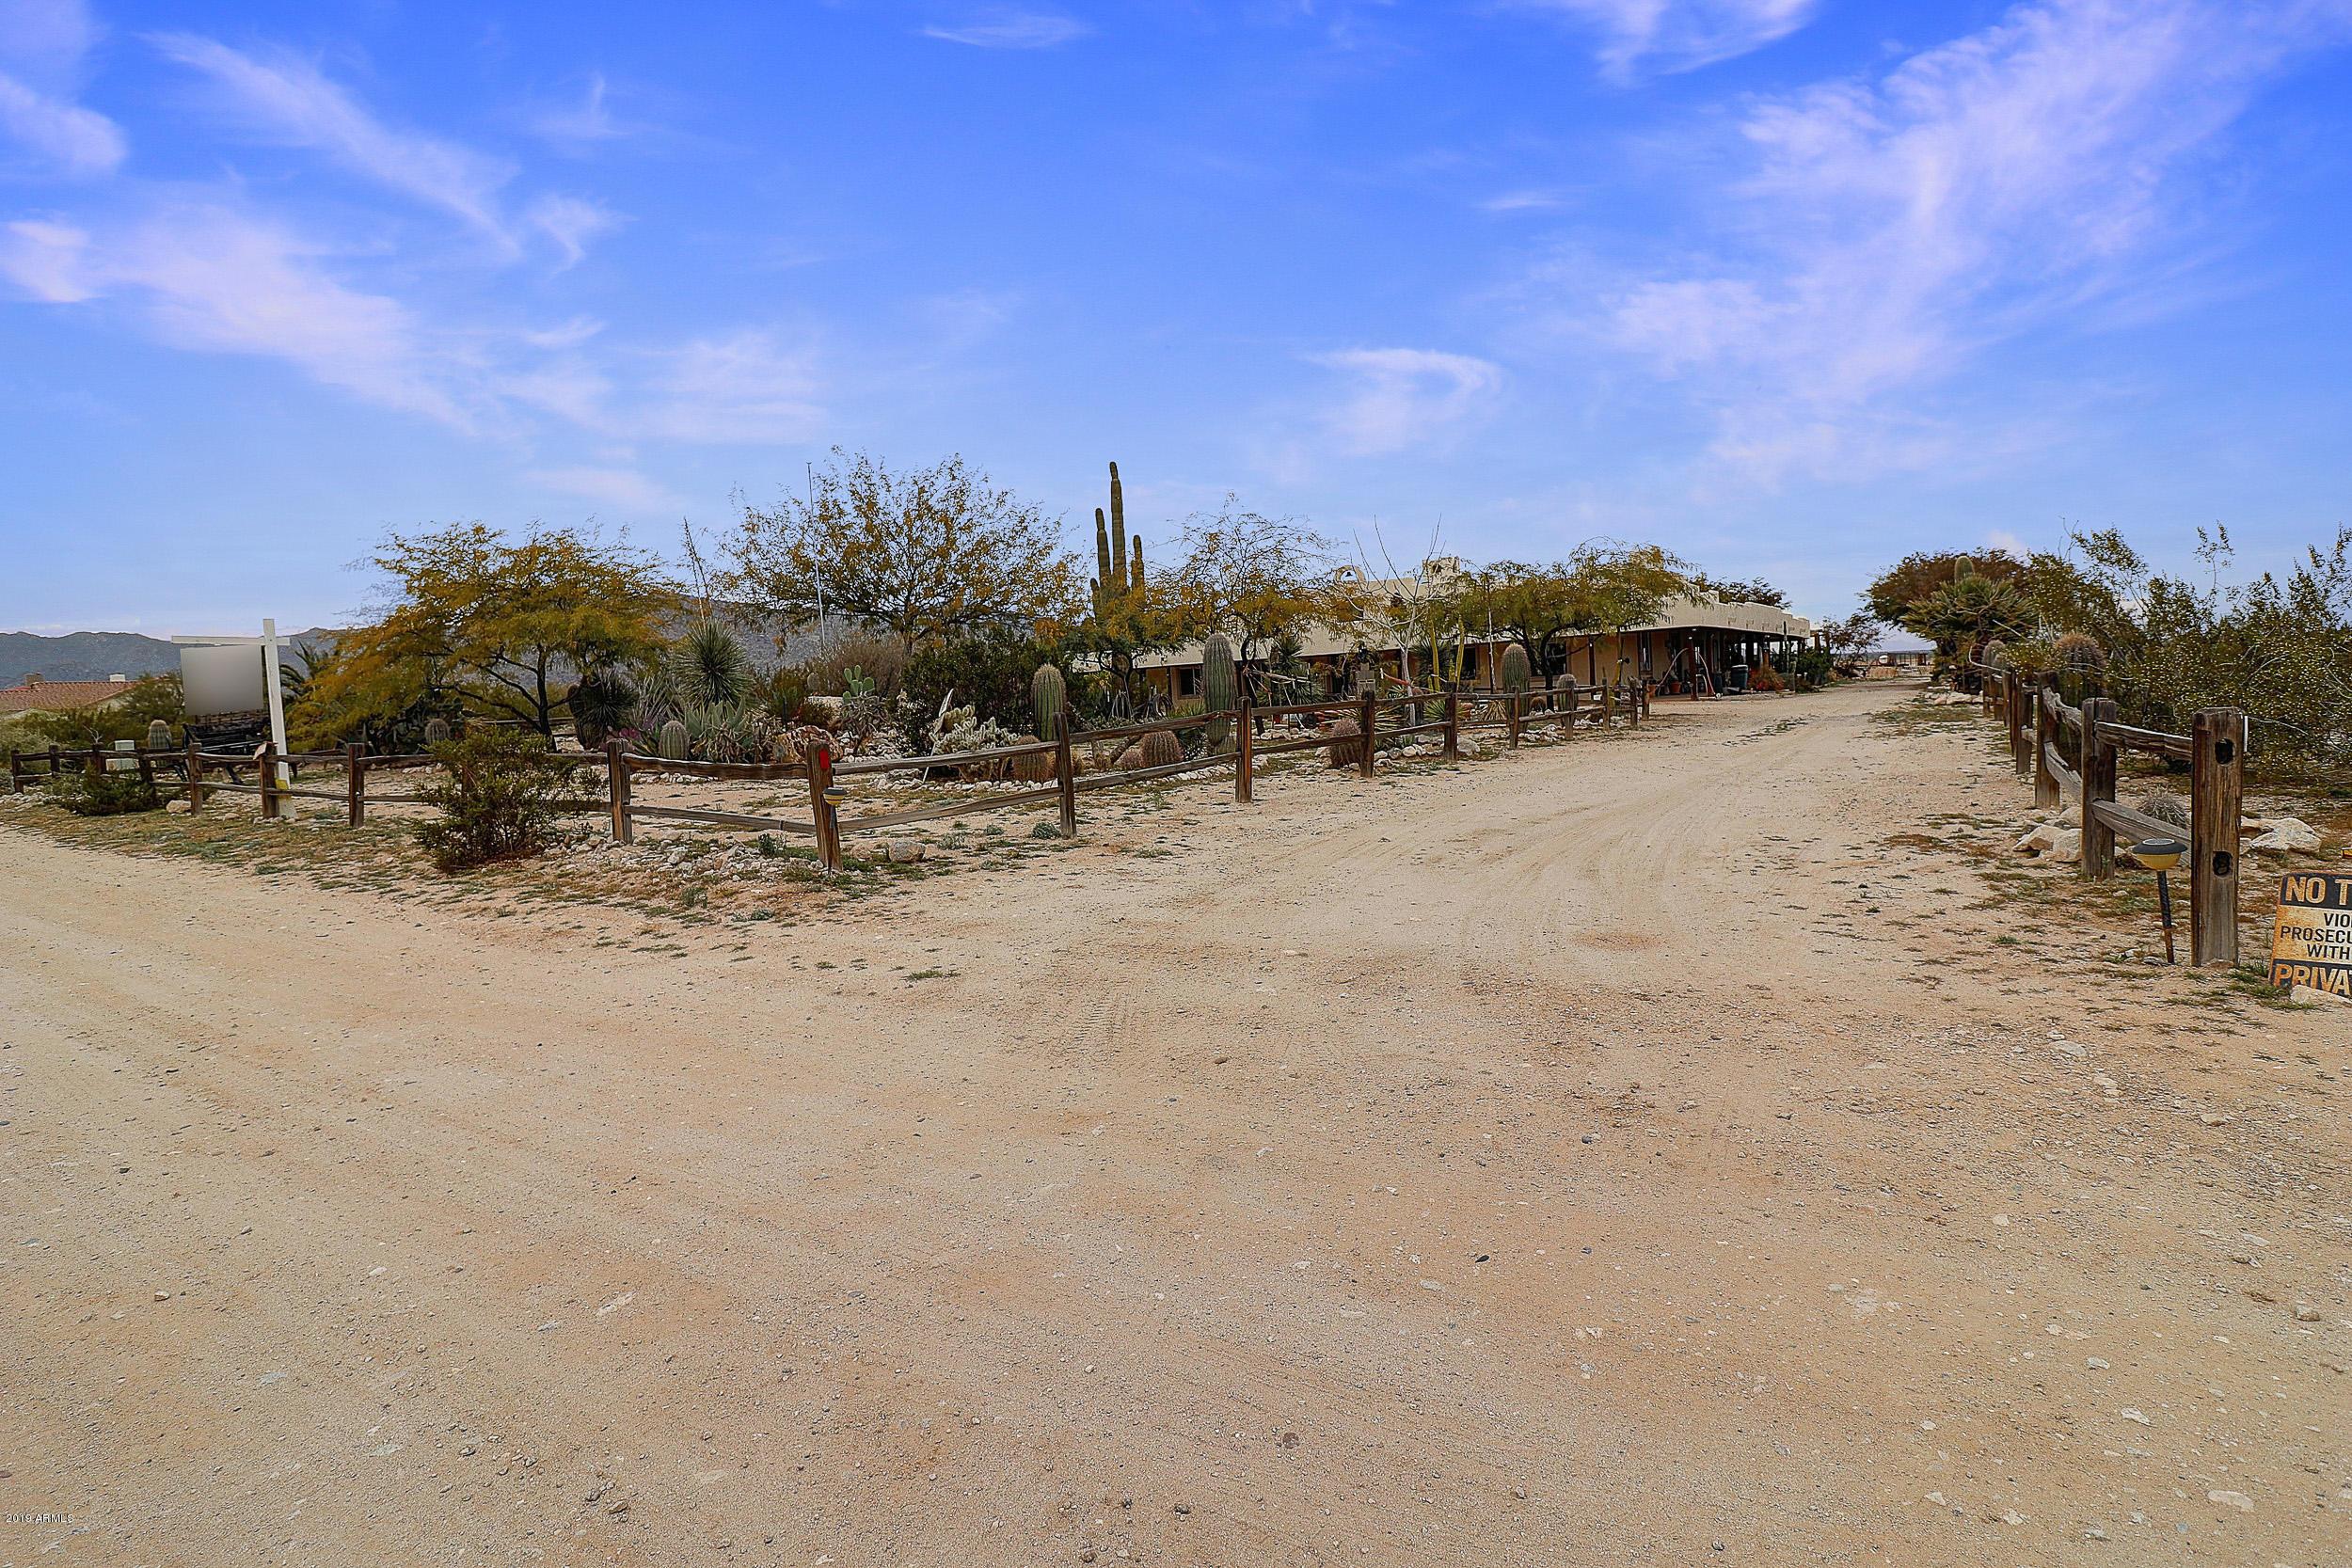 Litchfield Park AZ 85340 Photo 3